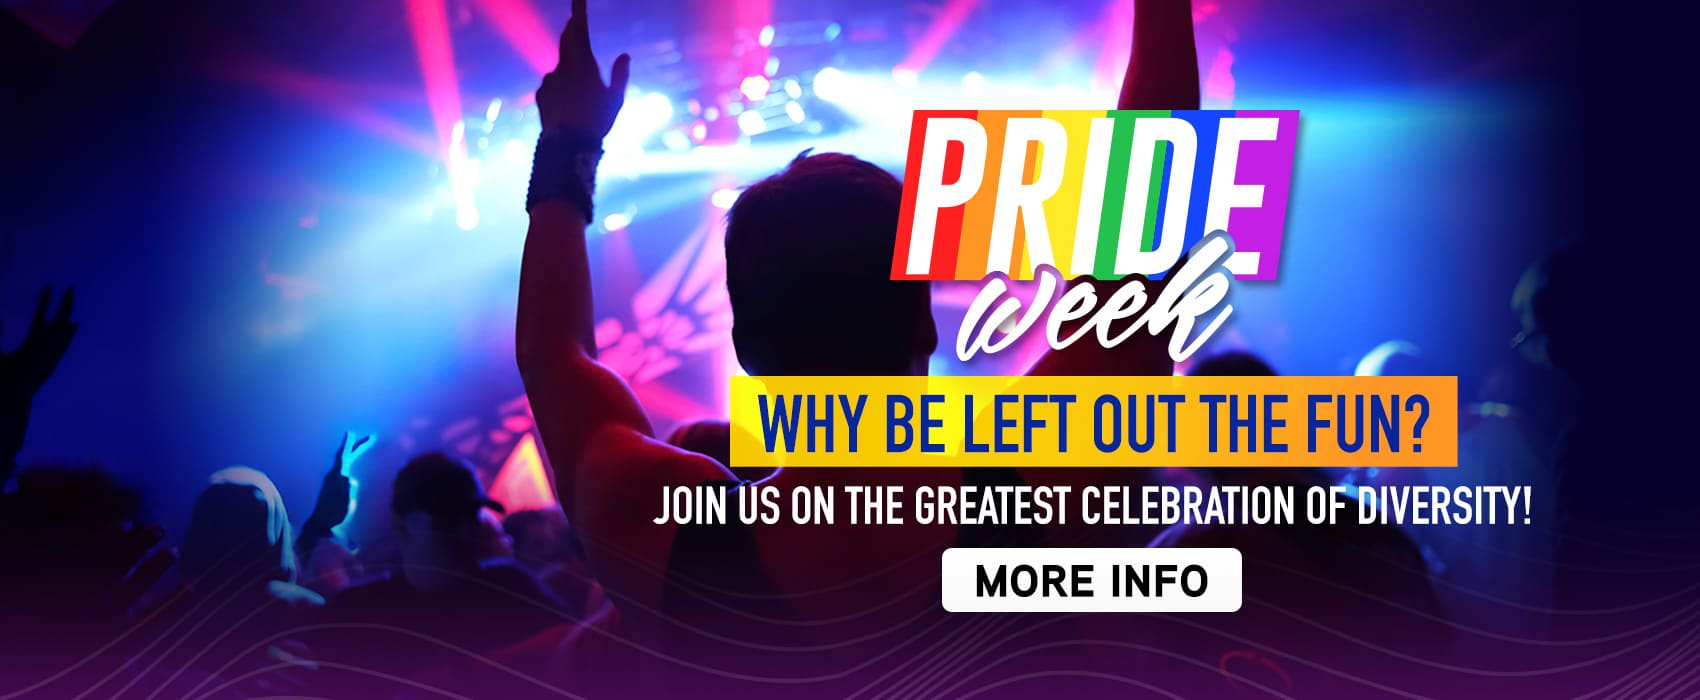 Temptation Cancun Resort Pride Week 2019